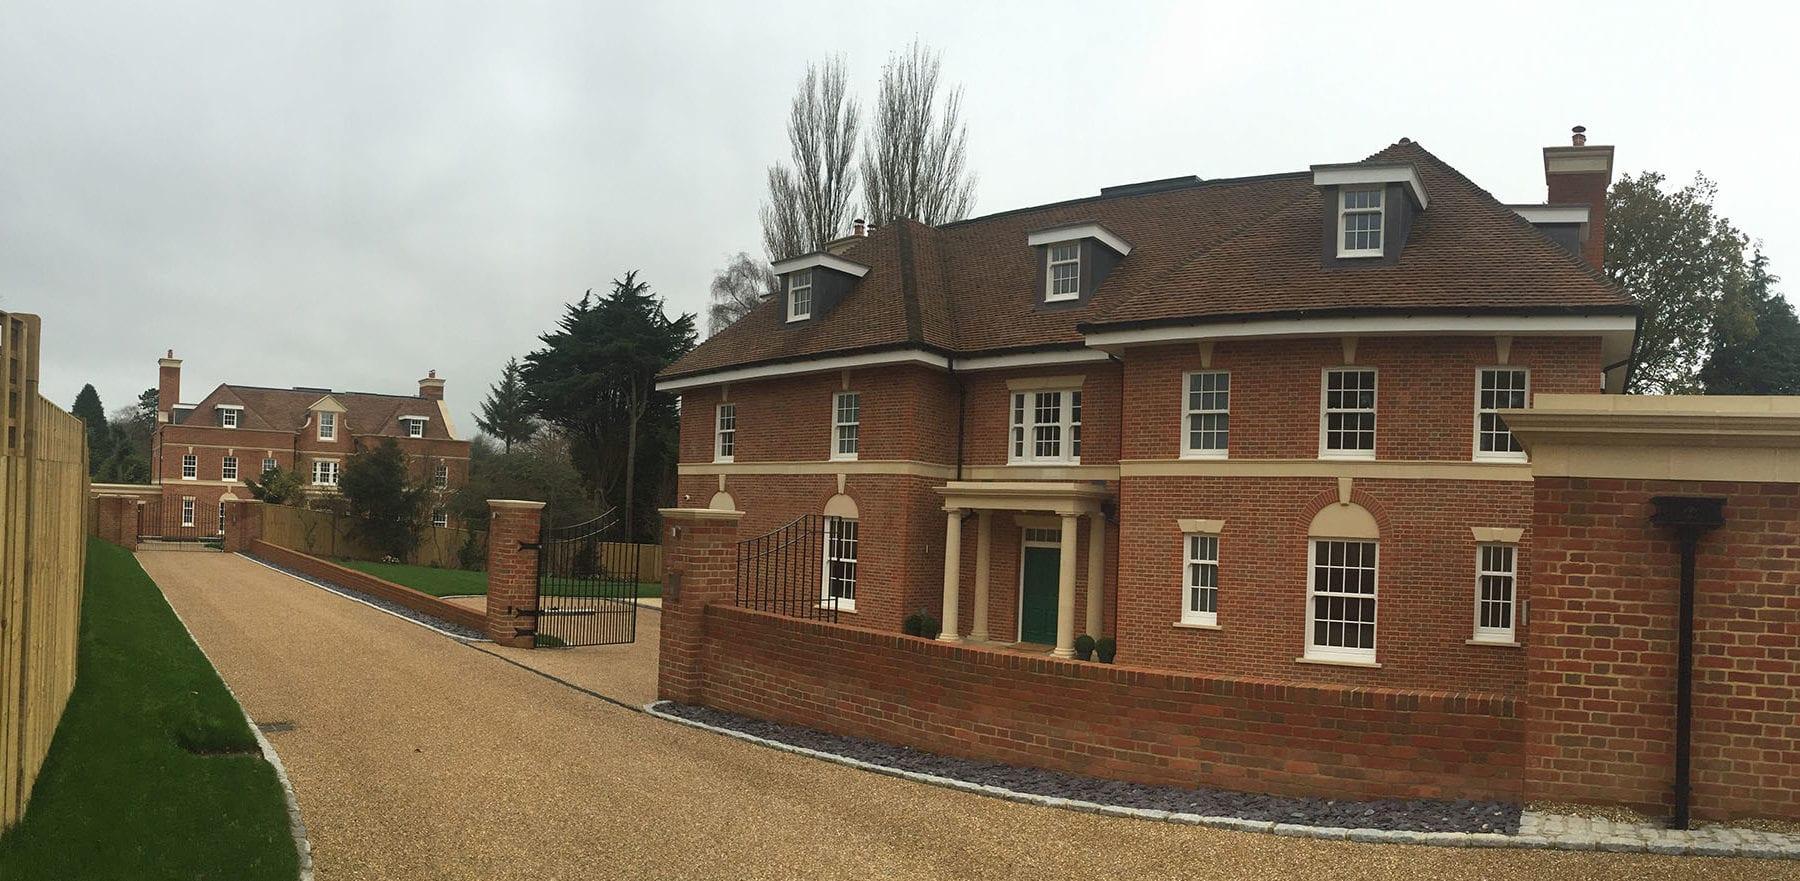 Lifestiles - Handmade Brown Clay Roof Tiles - Tunbridge Wells, England